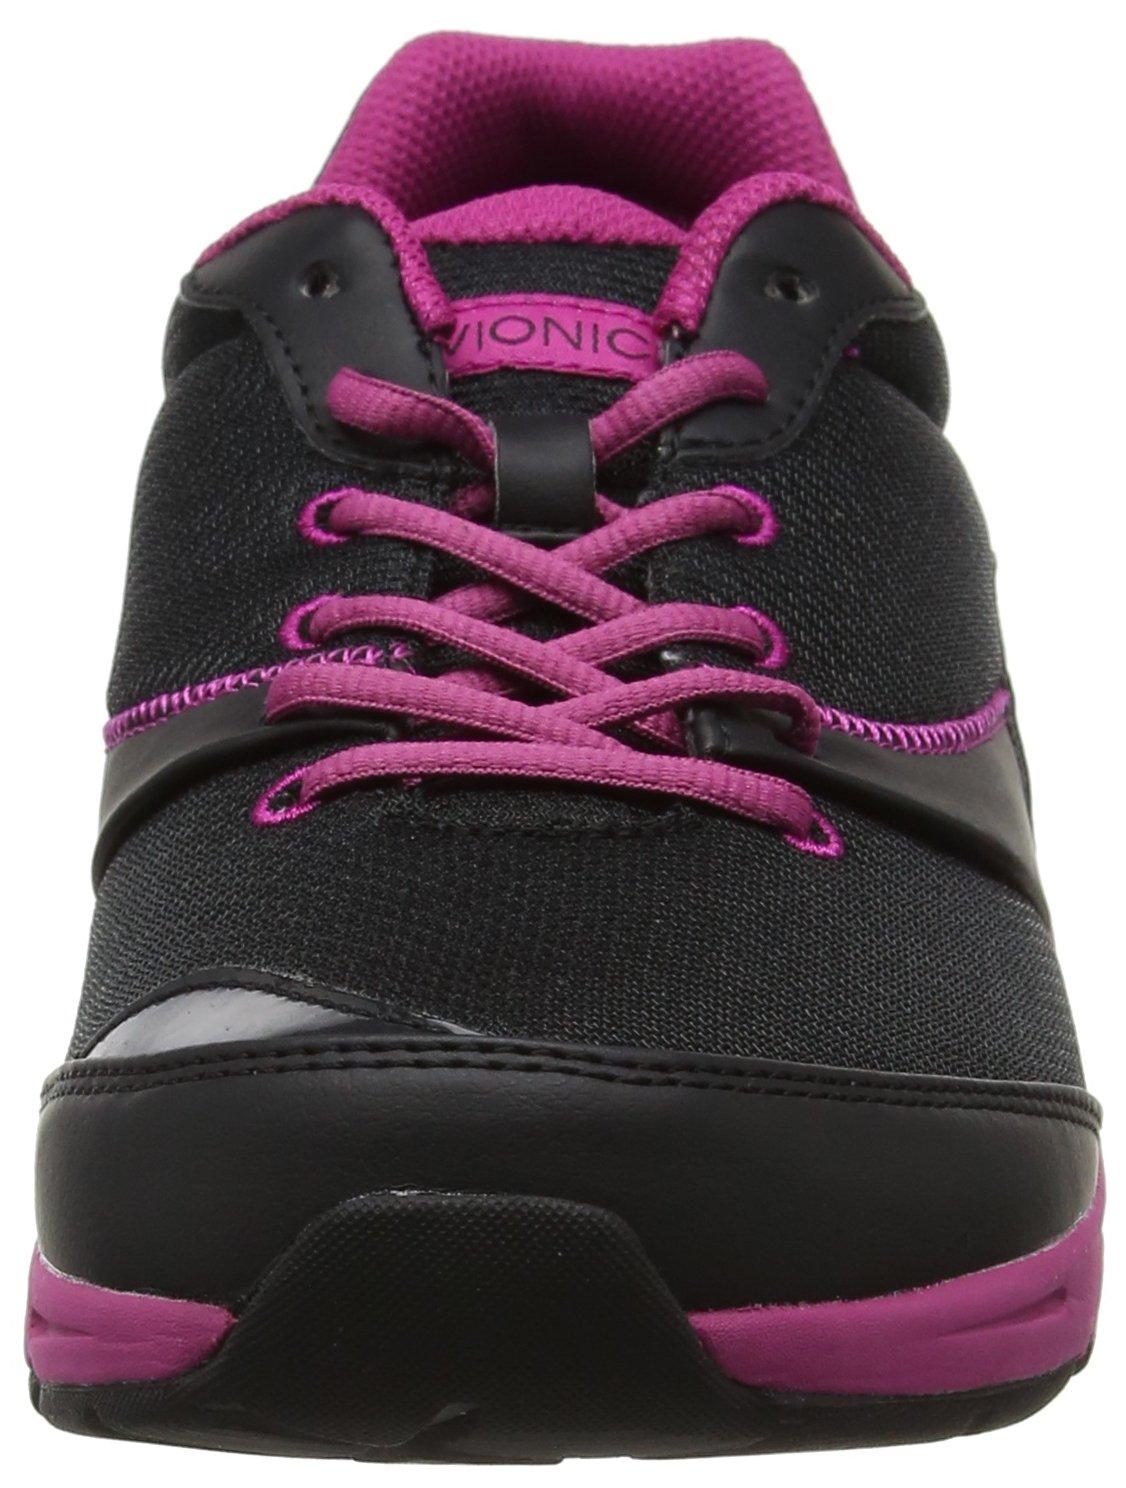 Vionic Kona Women's 6 Orthotic Athletic Shoe B01N3LY4JN 6 Women's B(M) US|Black/Fuchsia e3cdbf